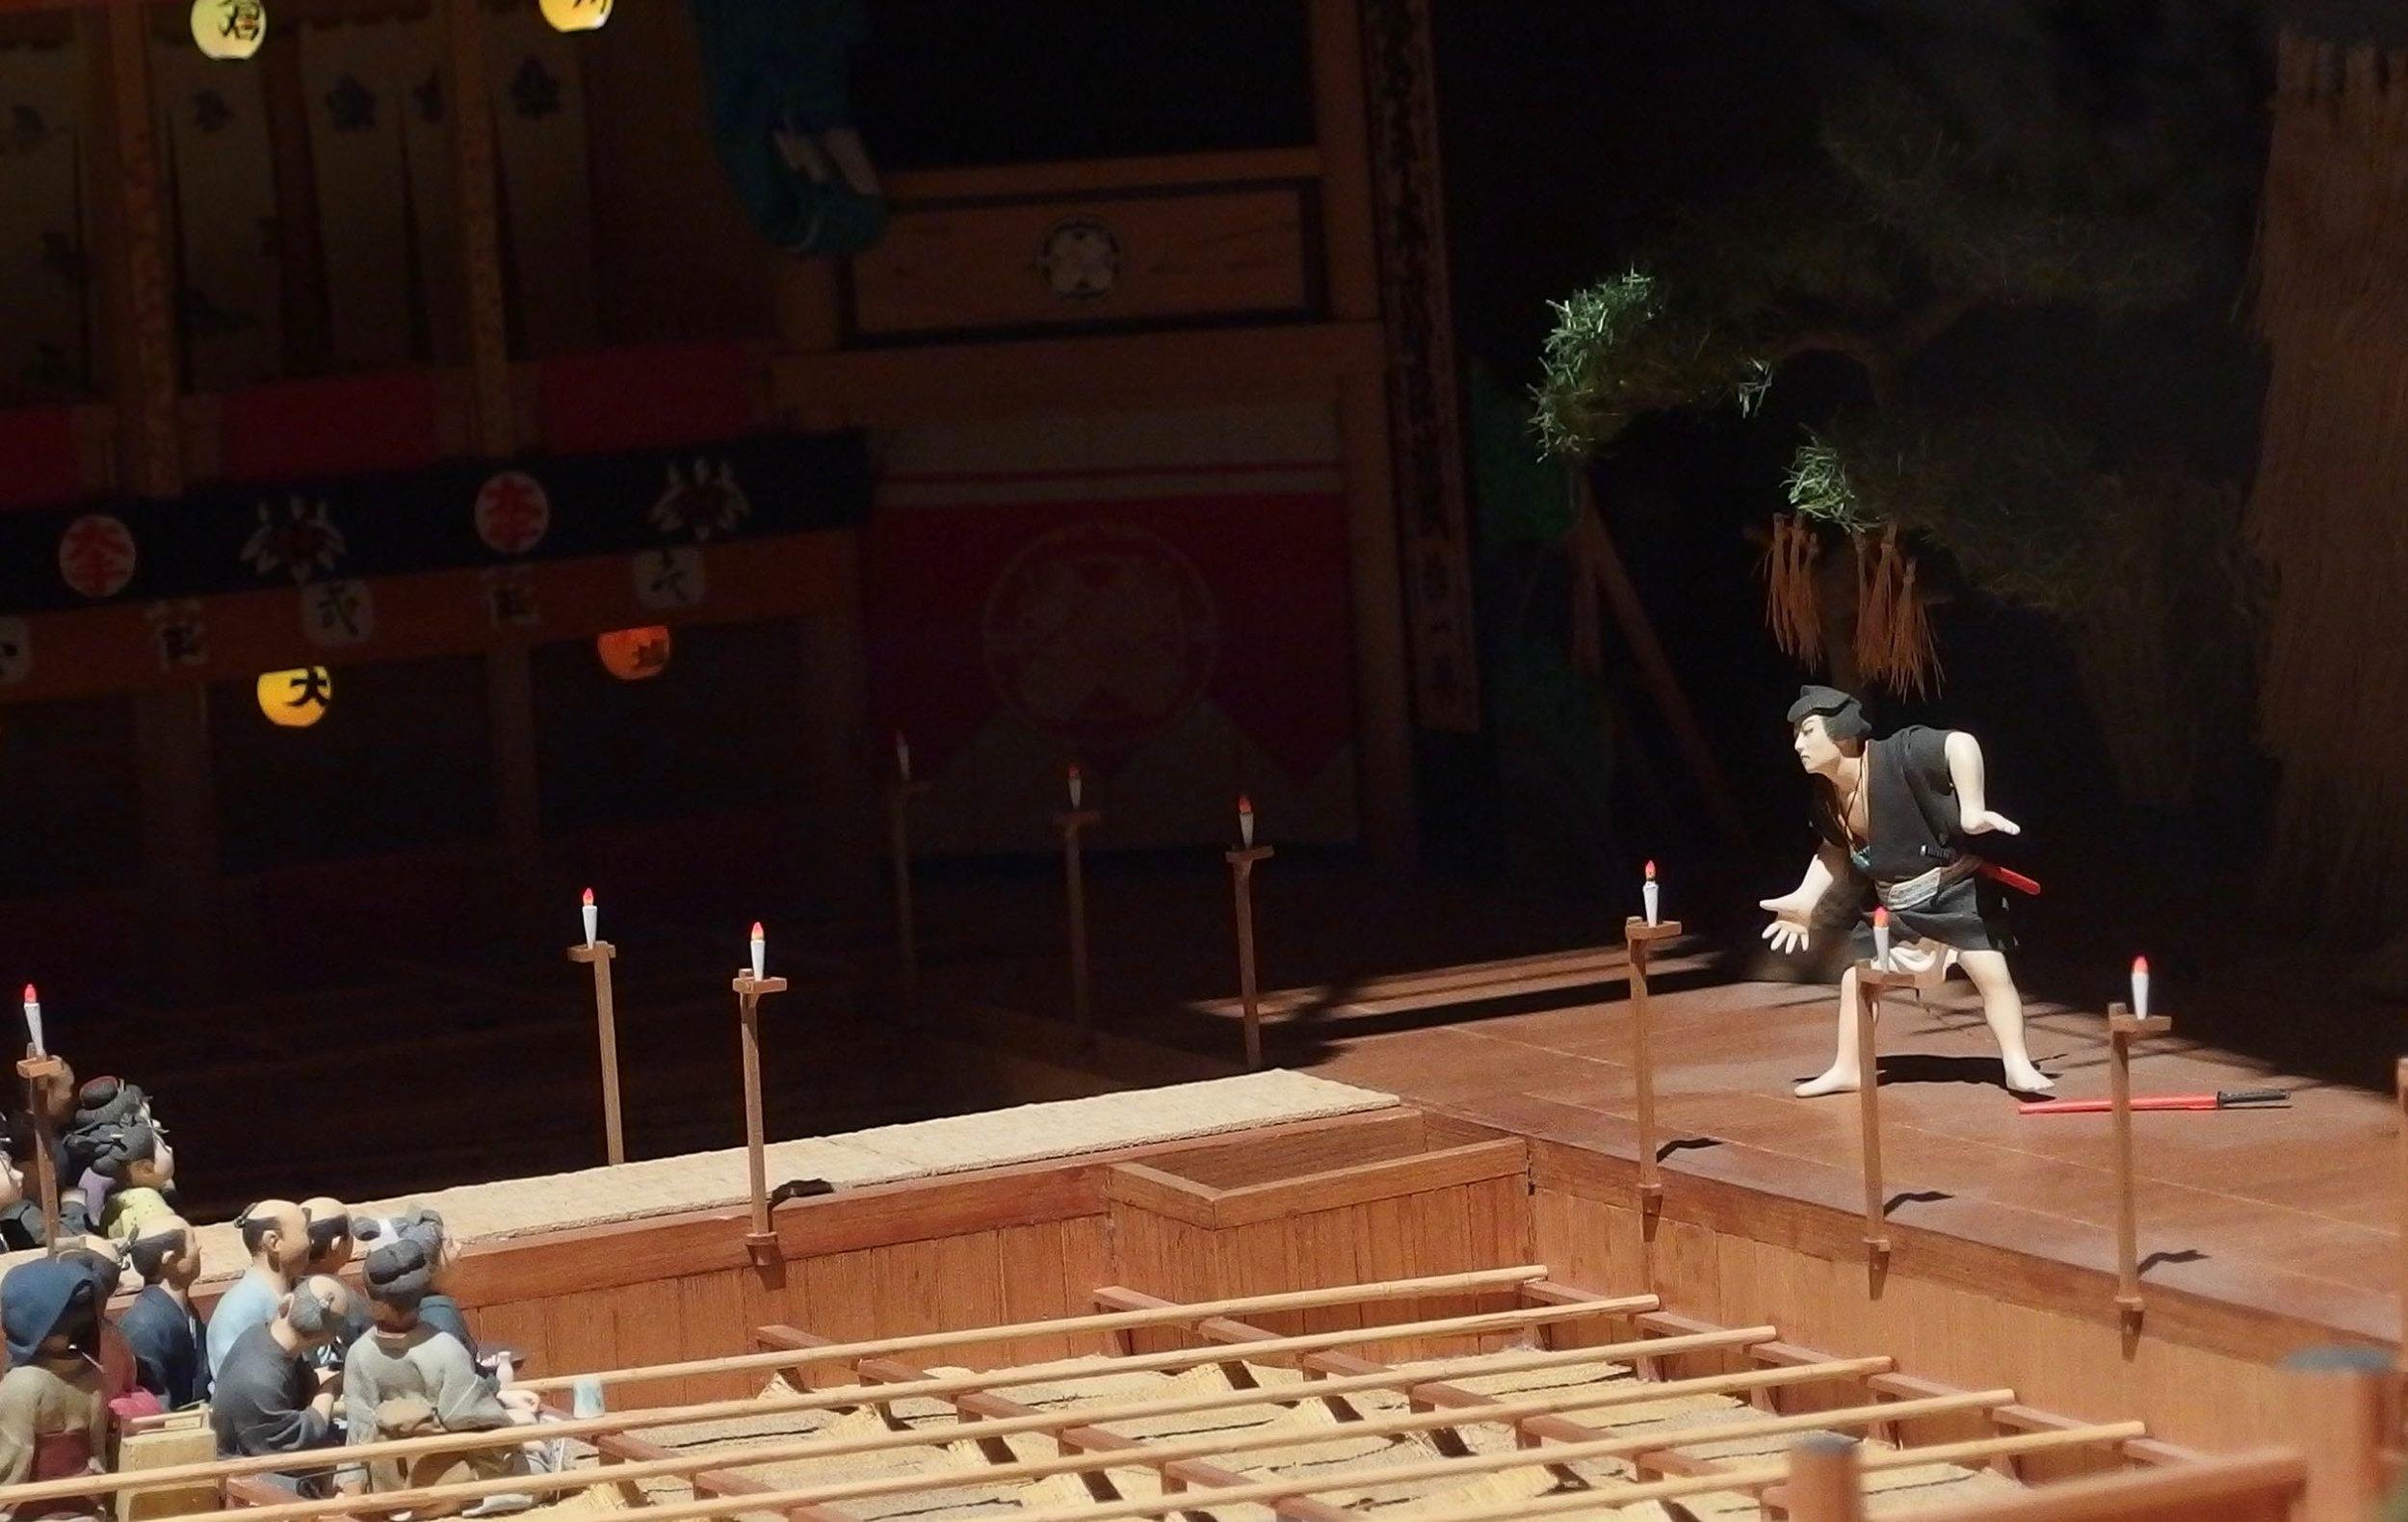 osaka museum of history kabuki actor model.jpg